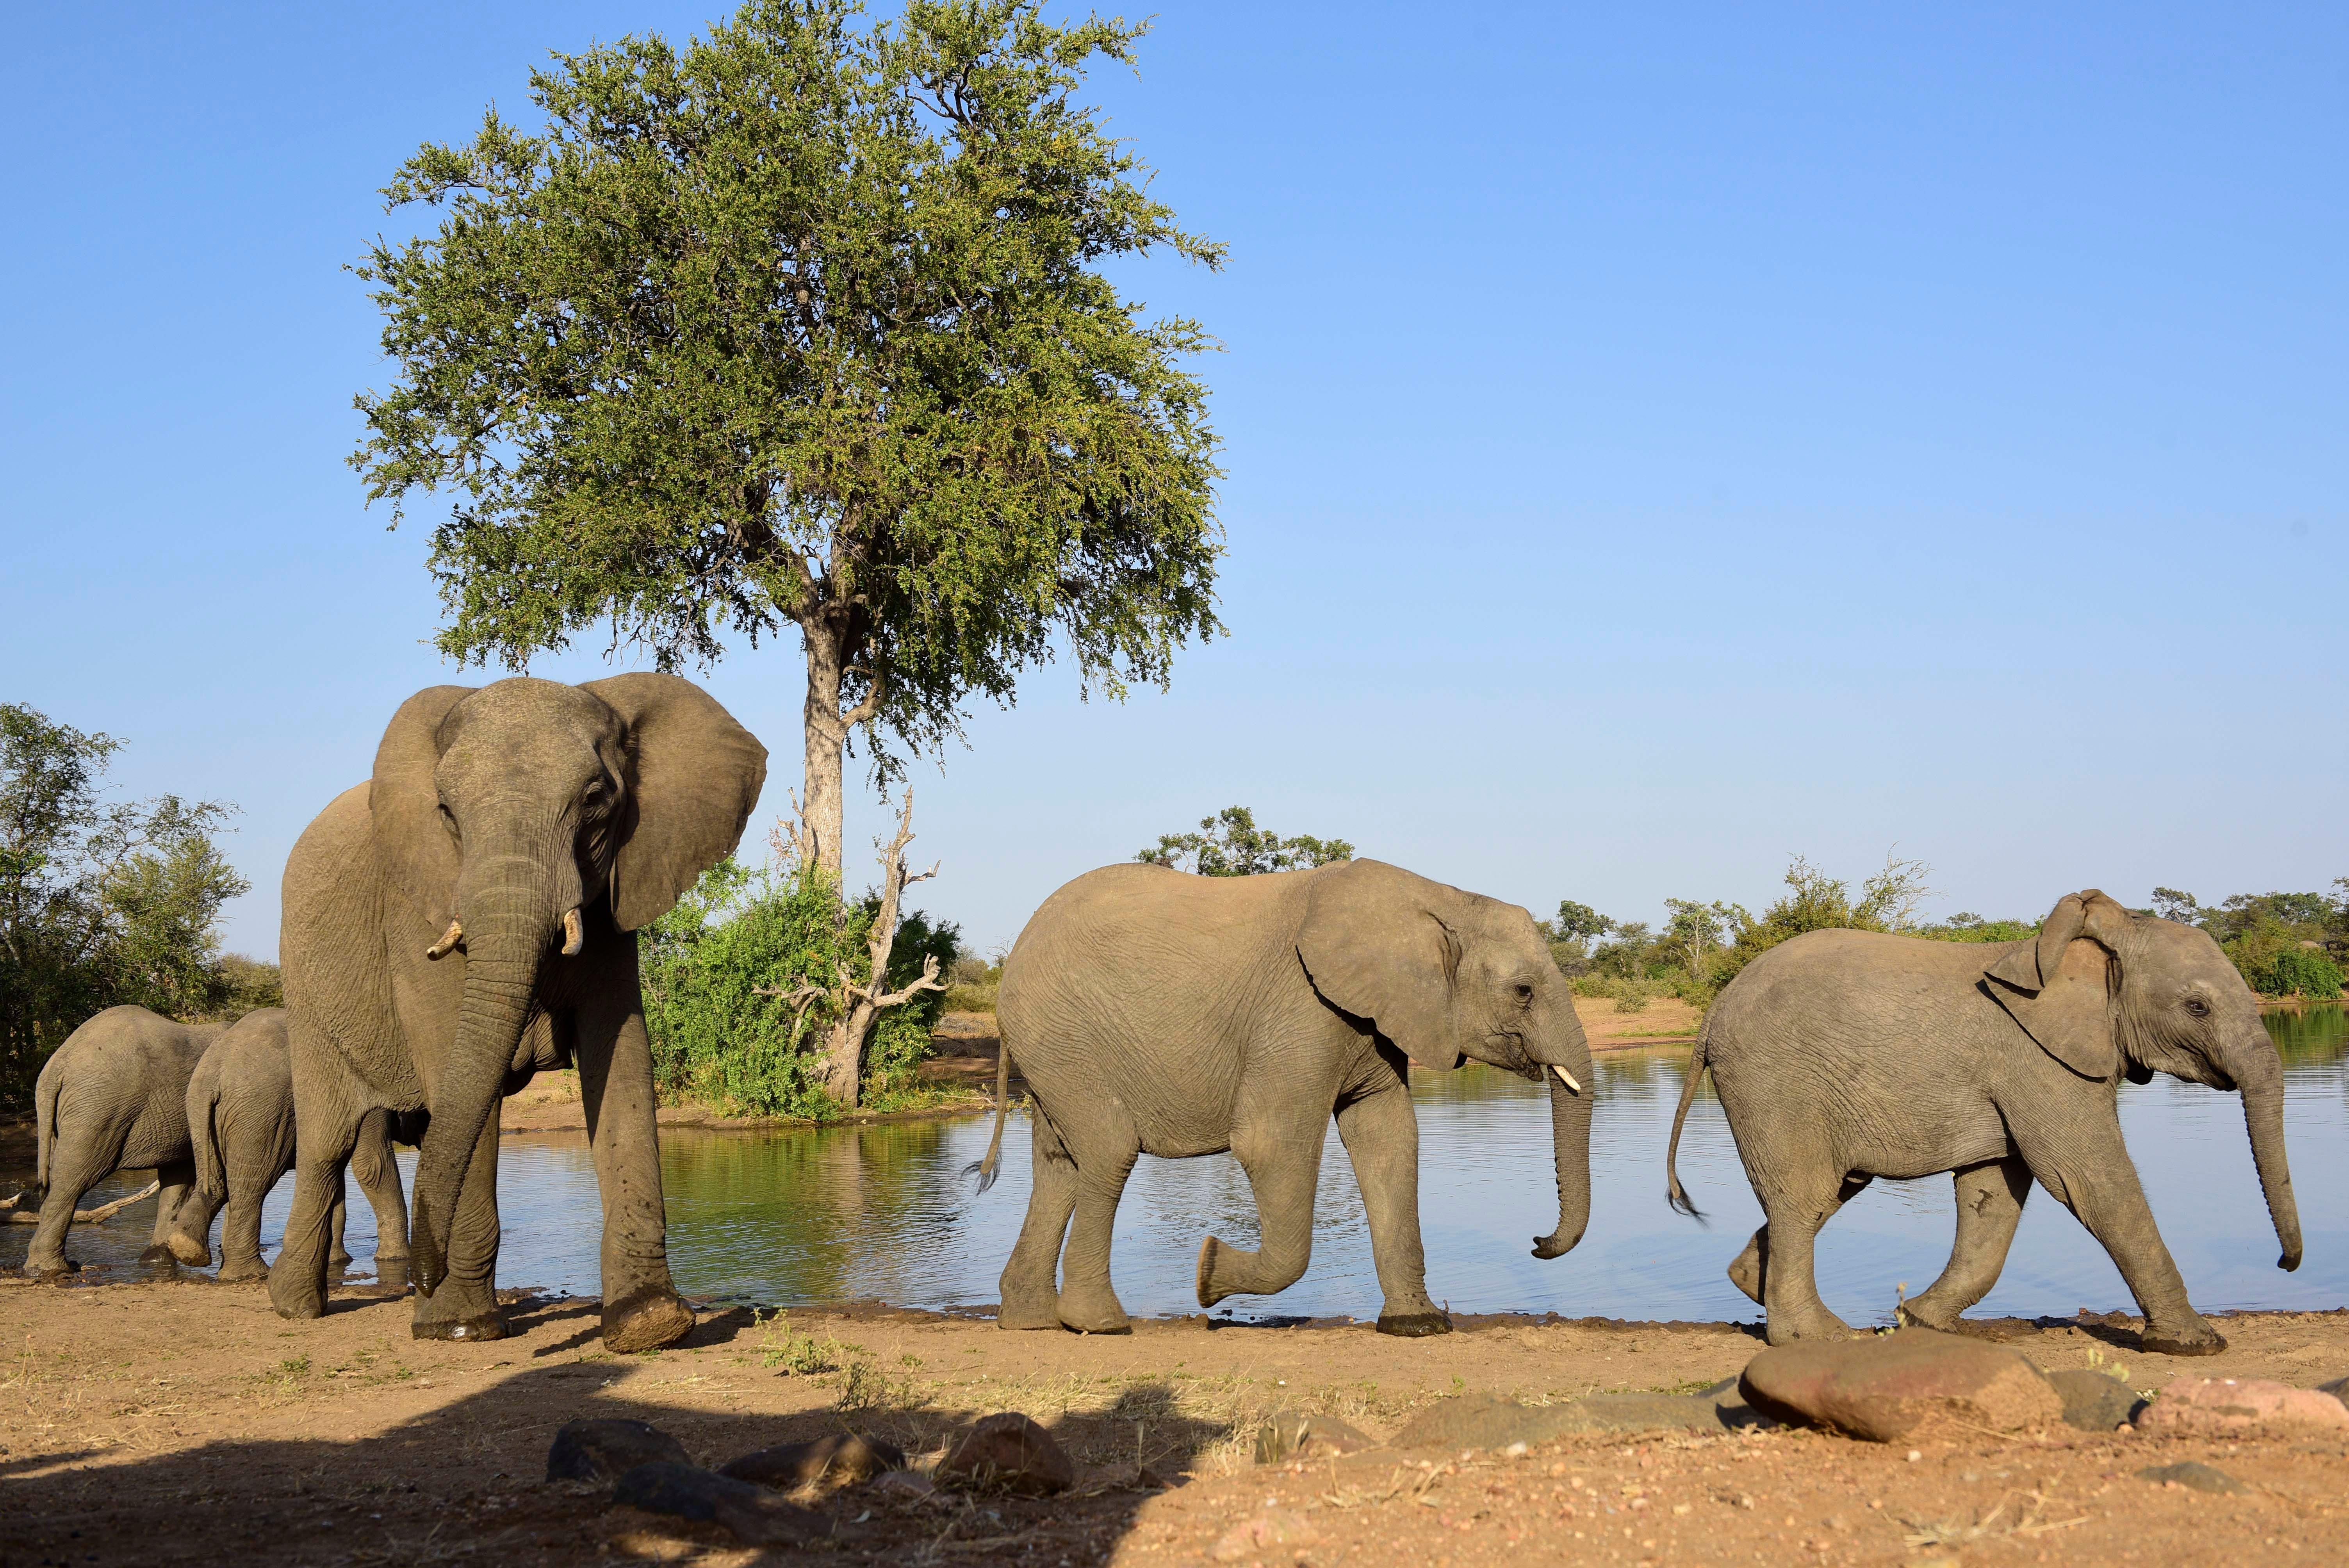 Elephants in Africa, Travel Africa, Africa Safari Guide, Luxury African Safari